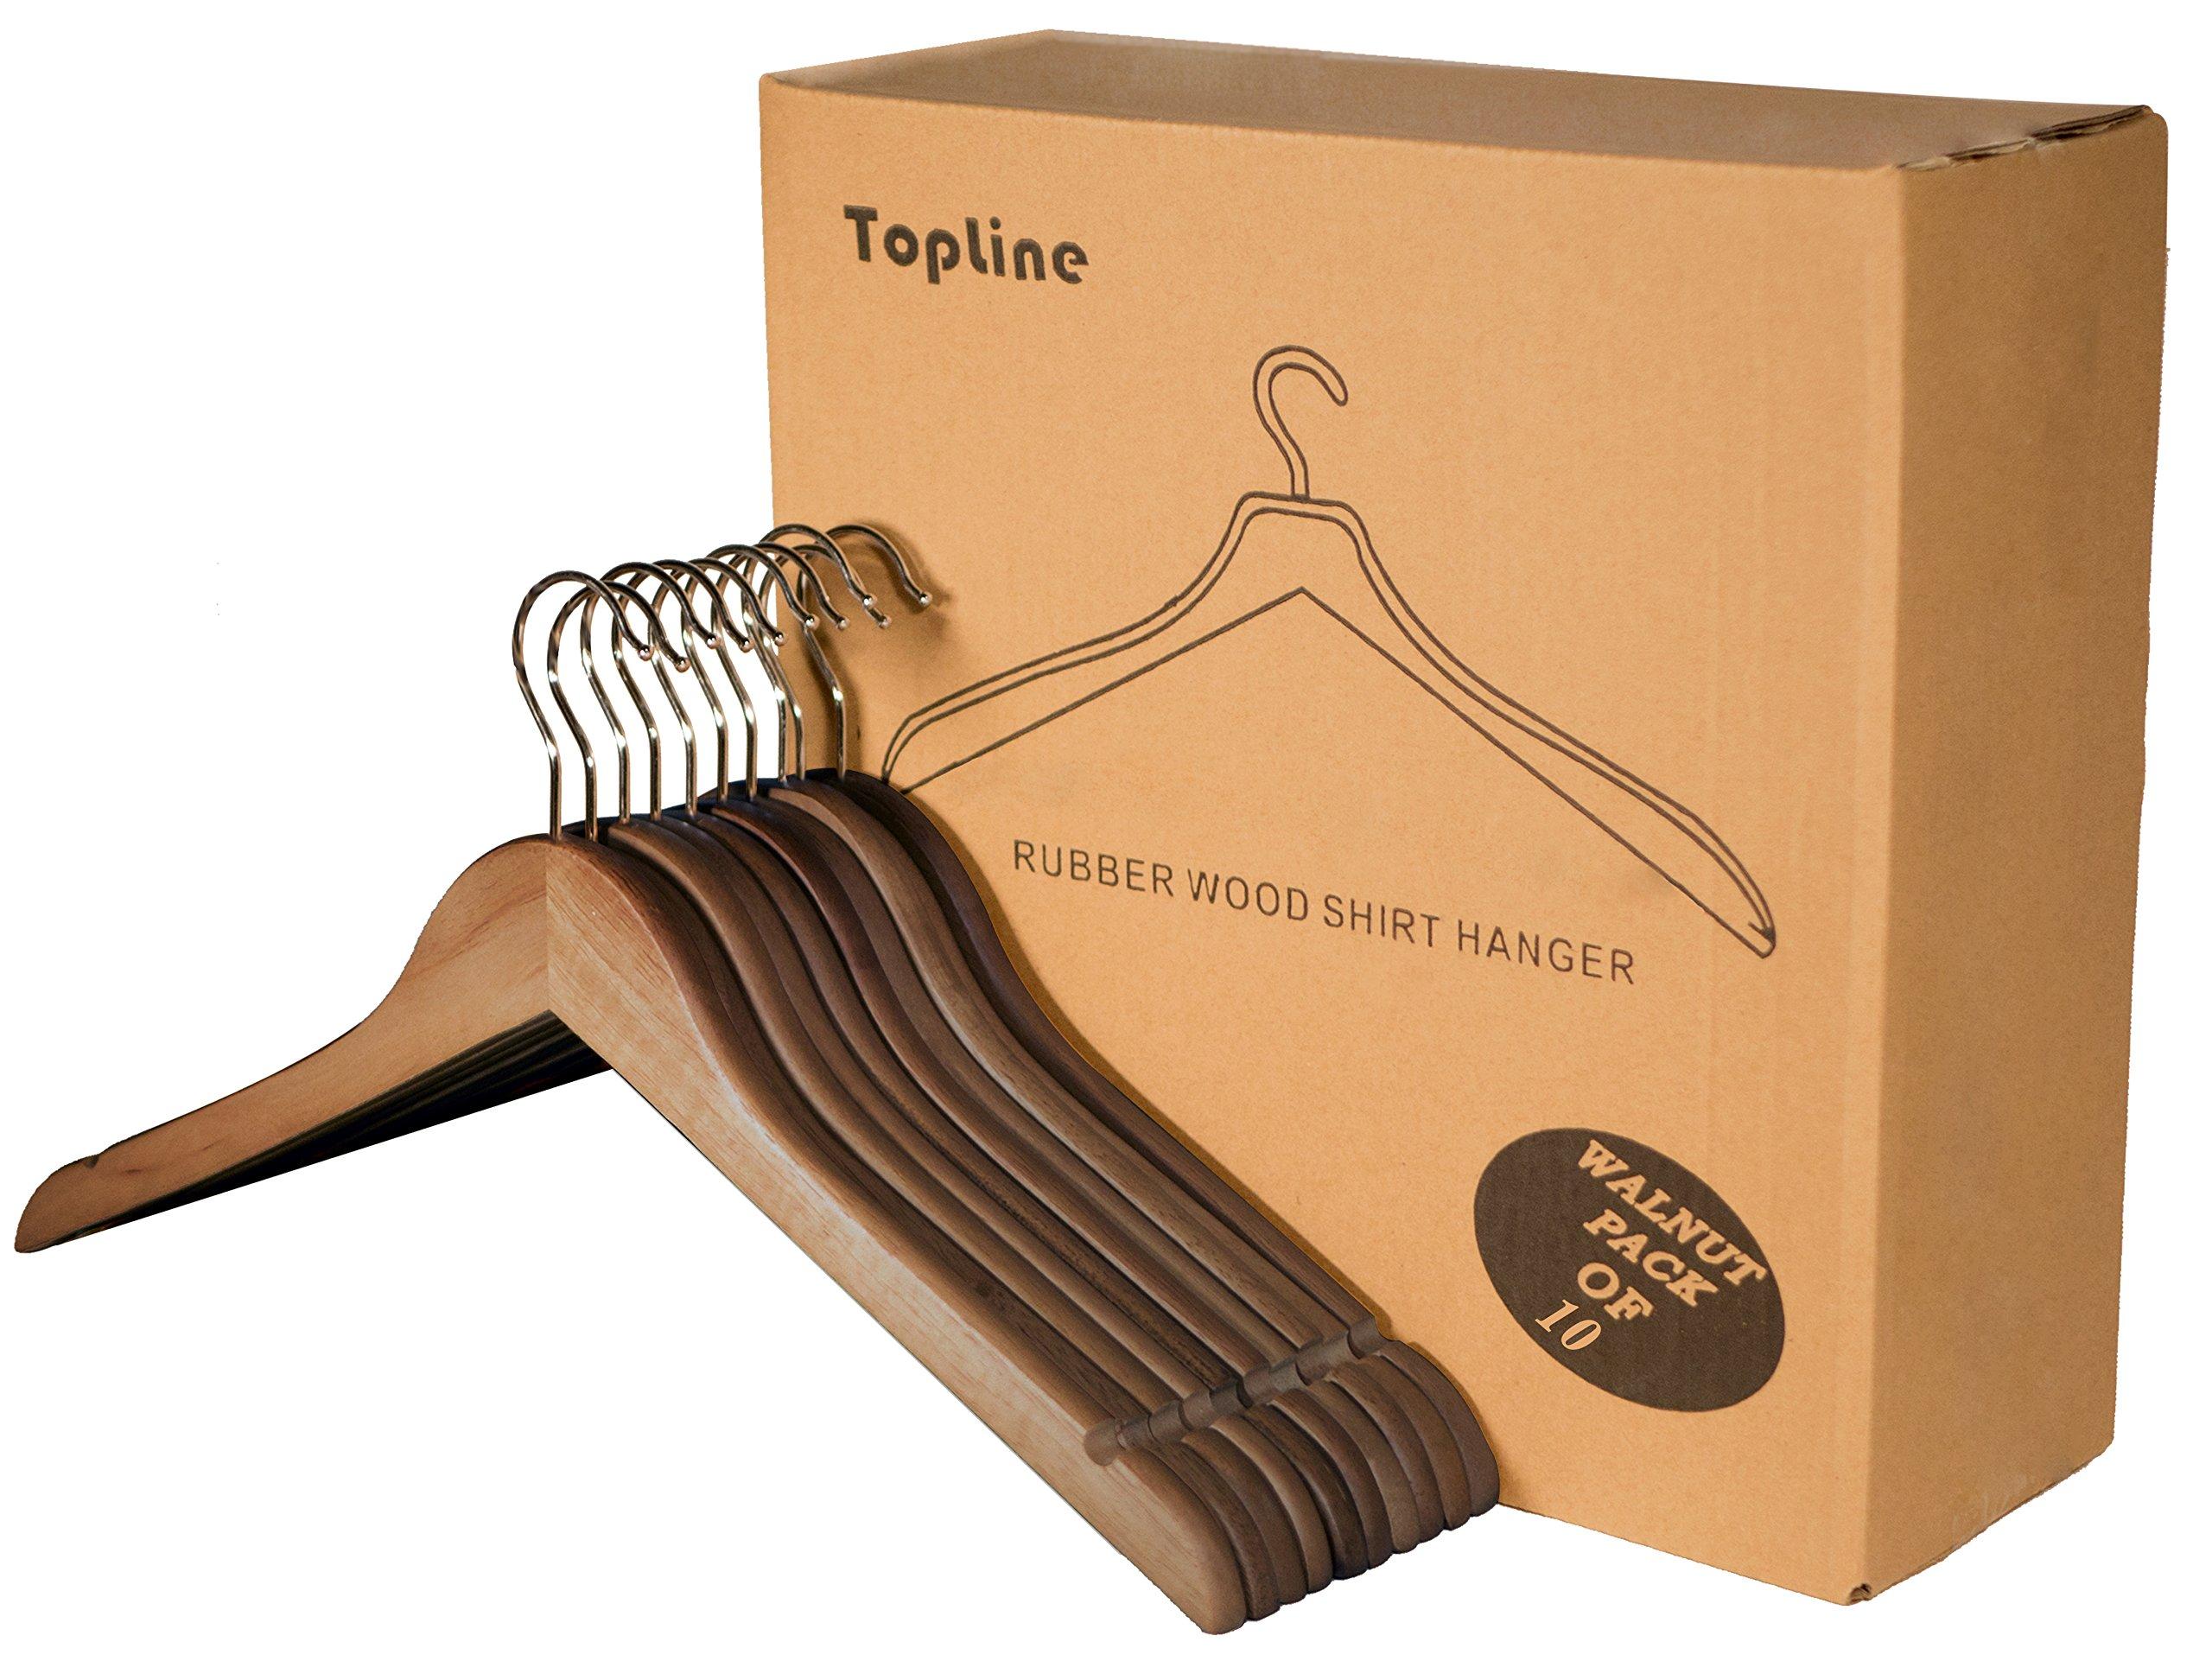 Topline Classic Wood Shirt Hangers - Walnut Finish (10-Pack)